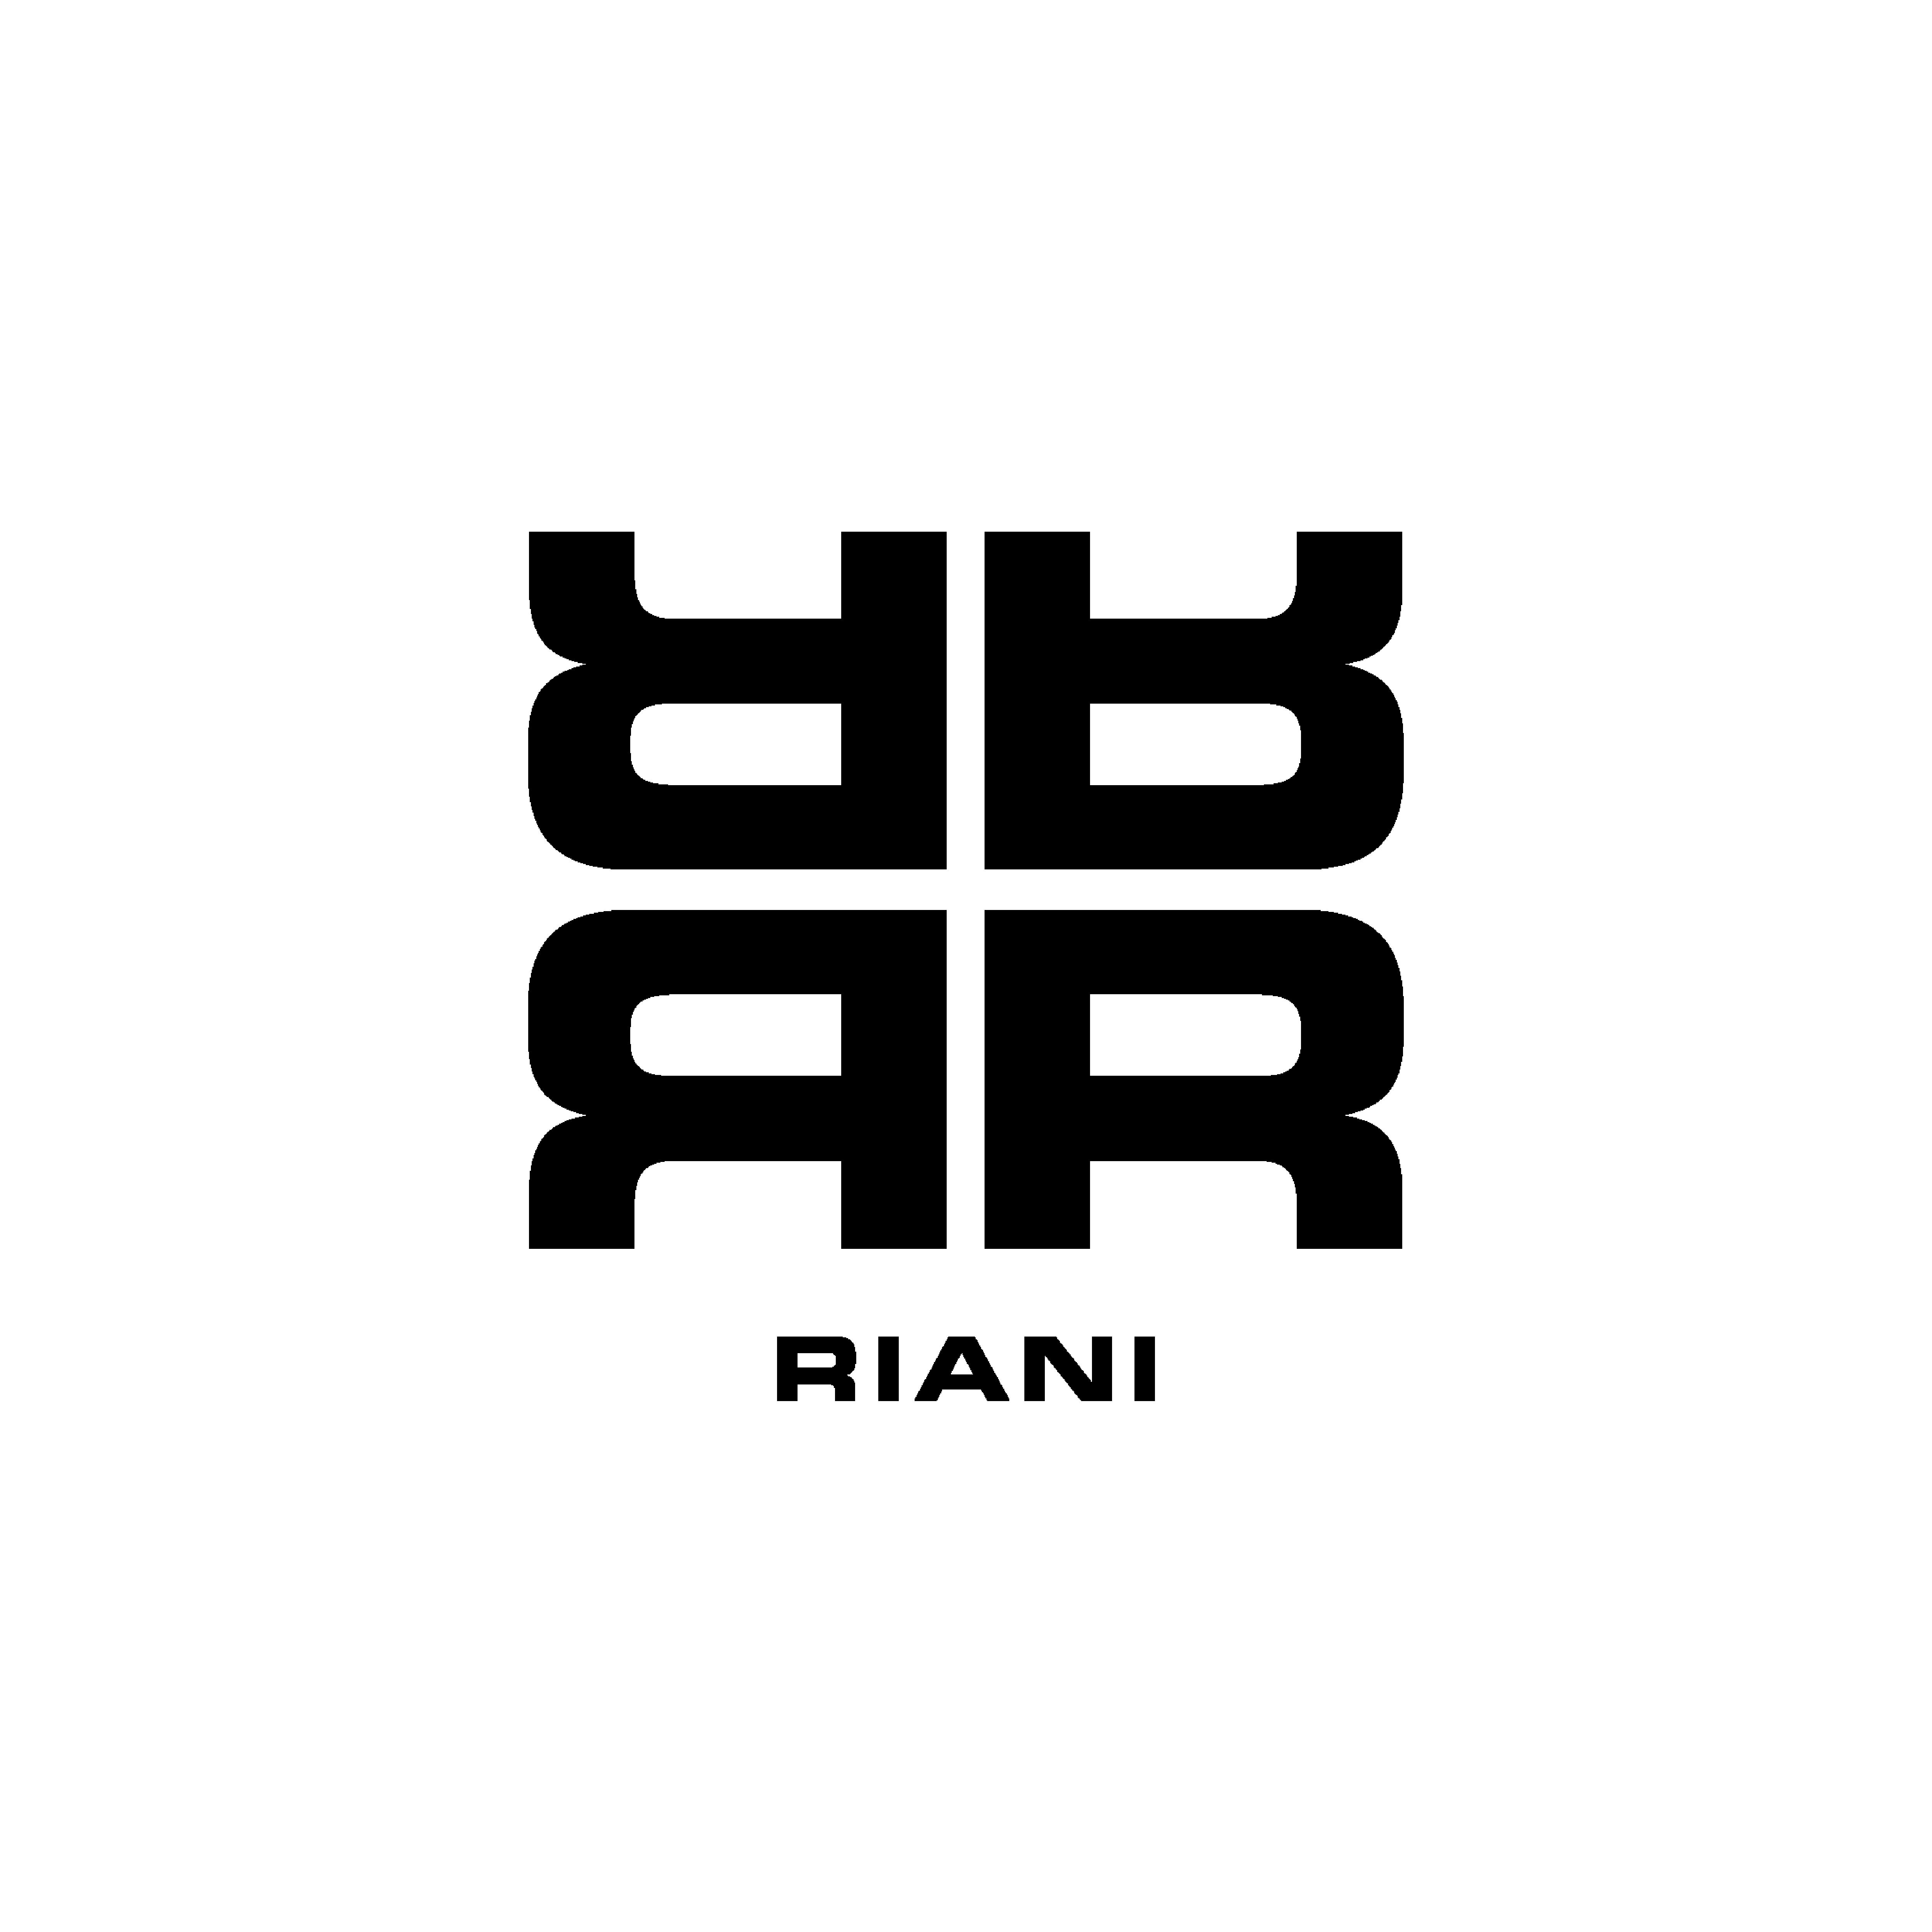 Logo RIANI